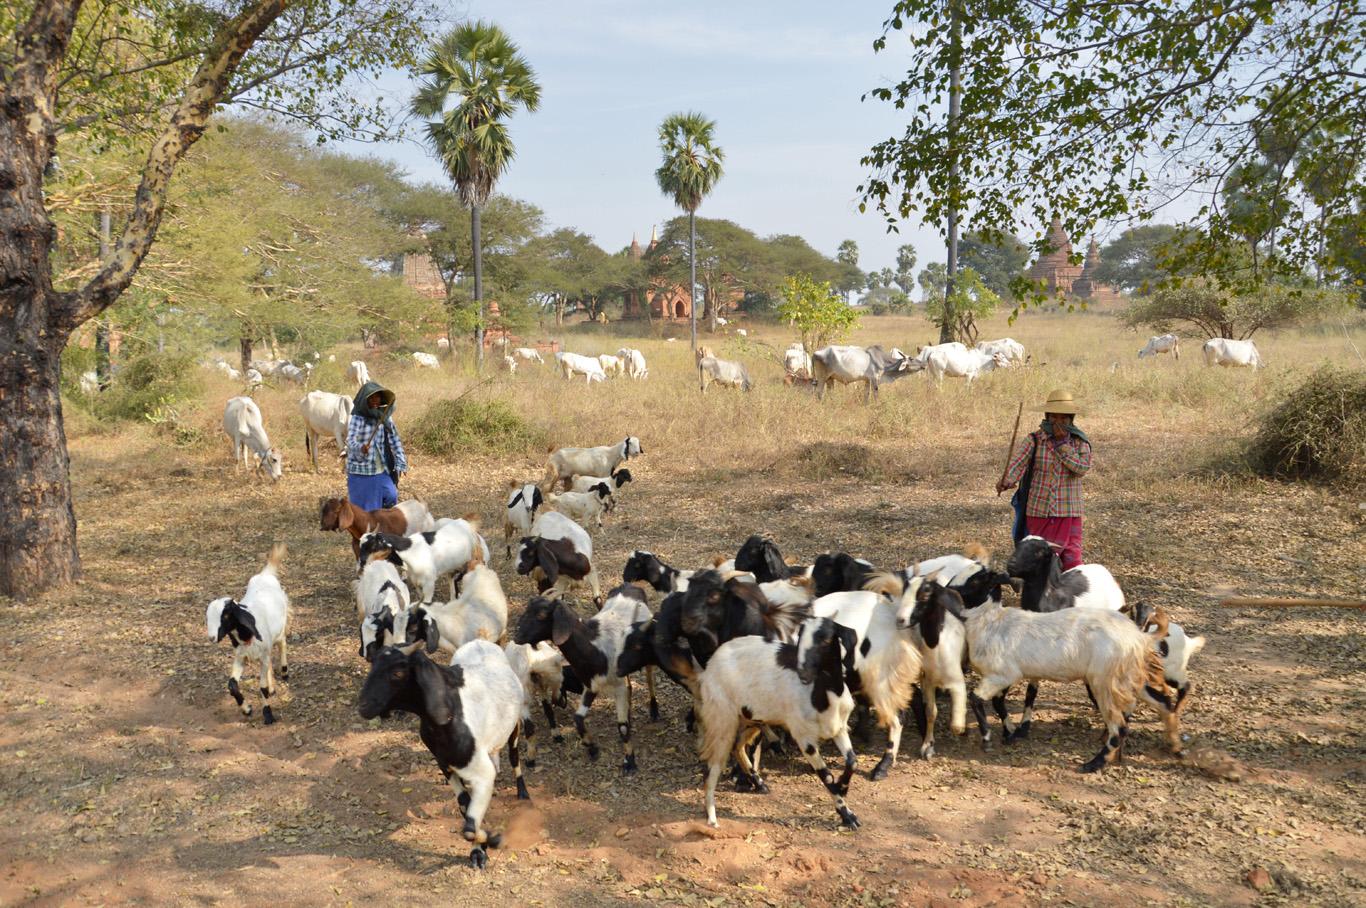 Local shepherds